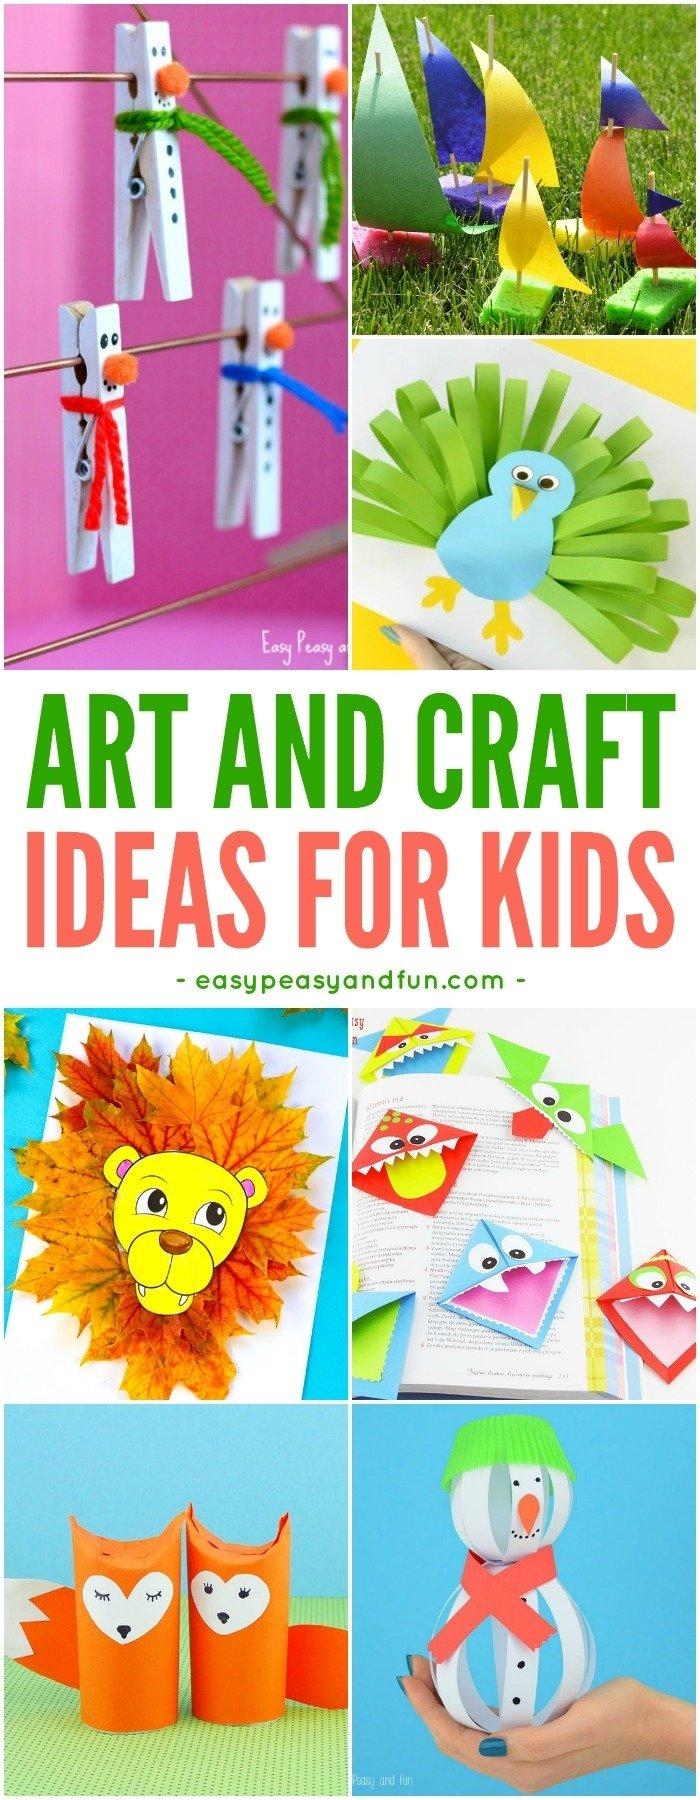 10 unique fun arts and crafts ideas